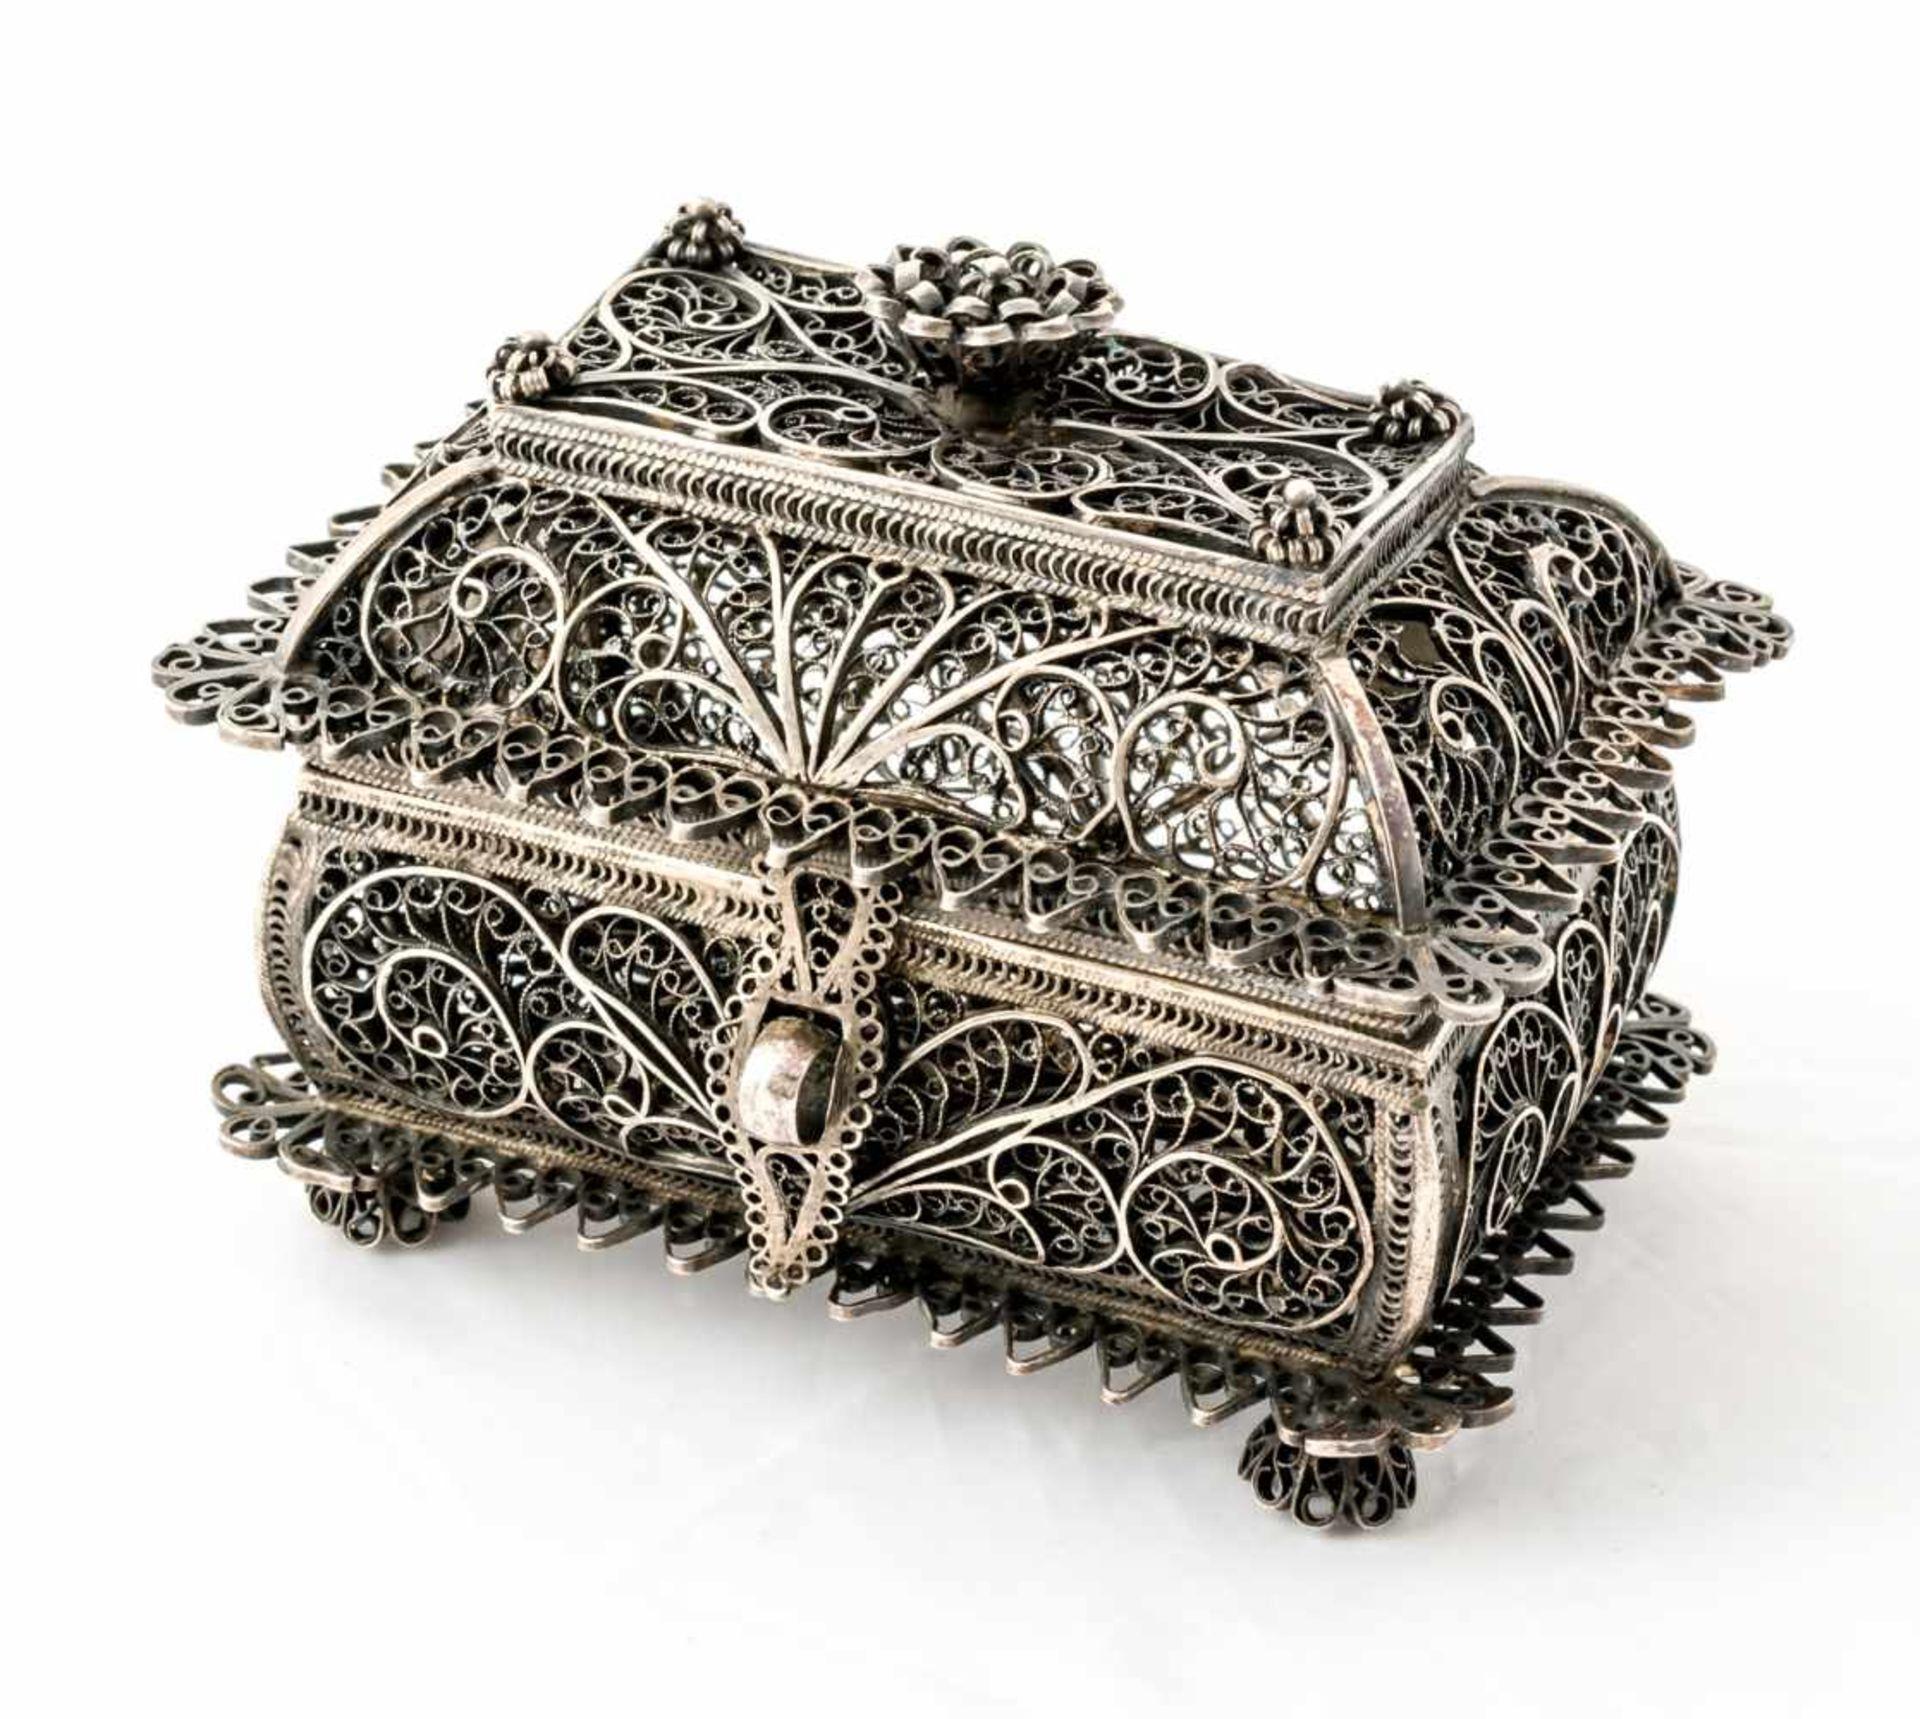 Filigrankästchen Russland, Silber (102g), Moskau 1843 Beschaumeister: wohl Andrej Kovalskij